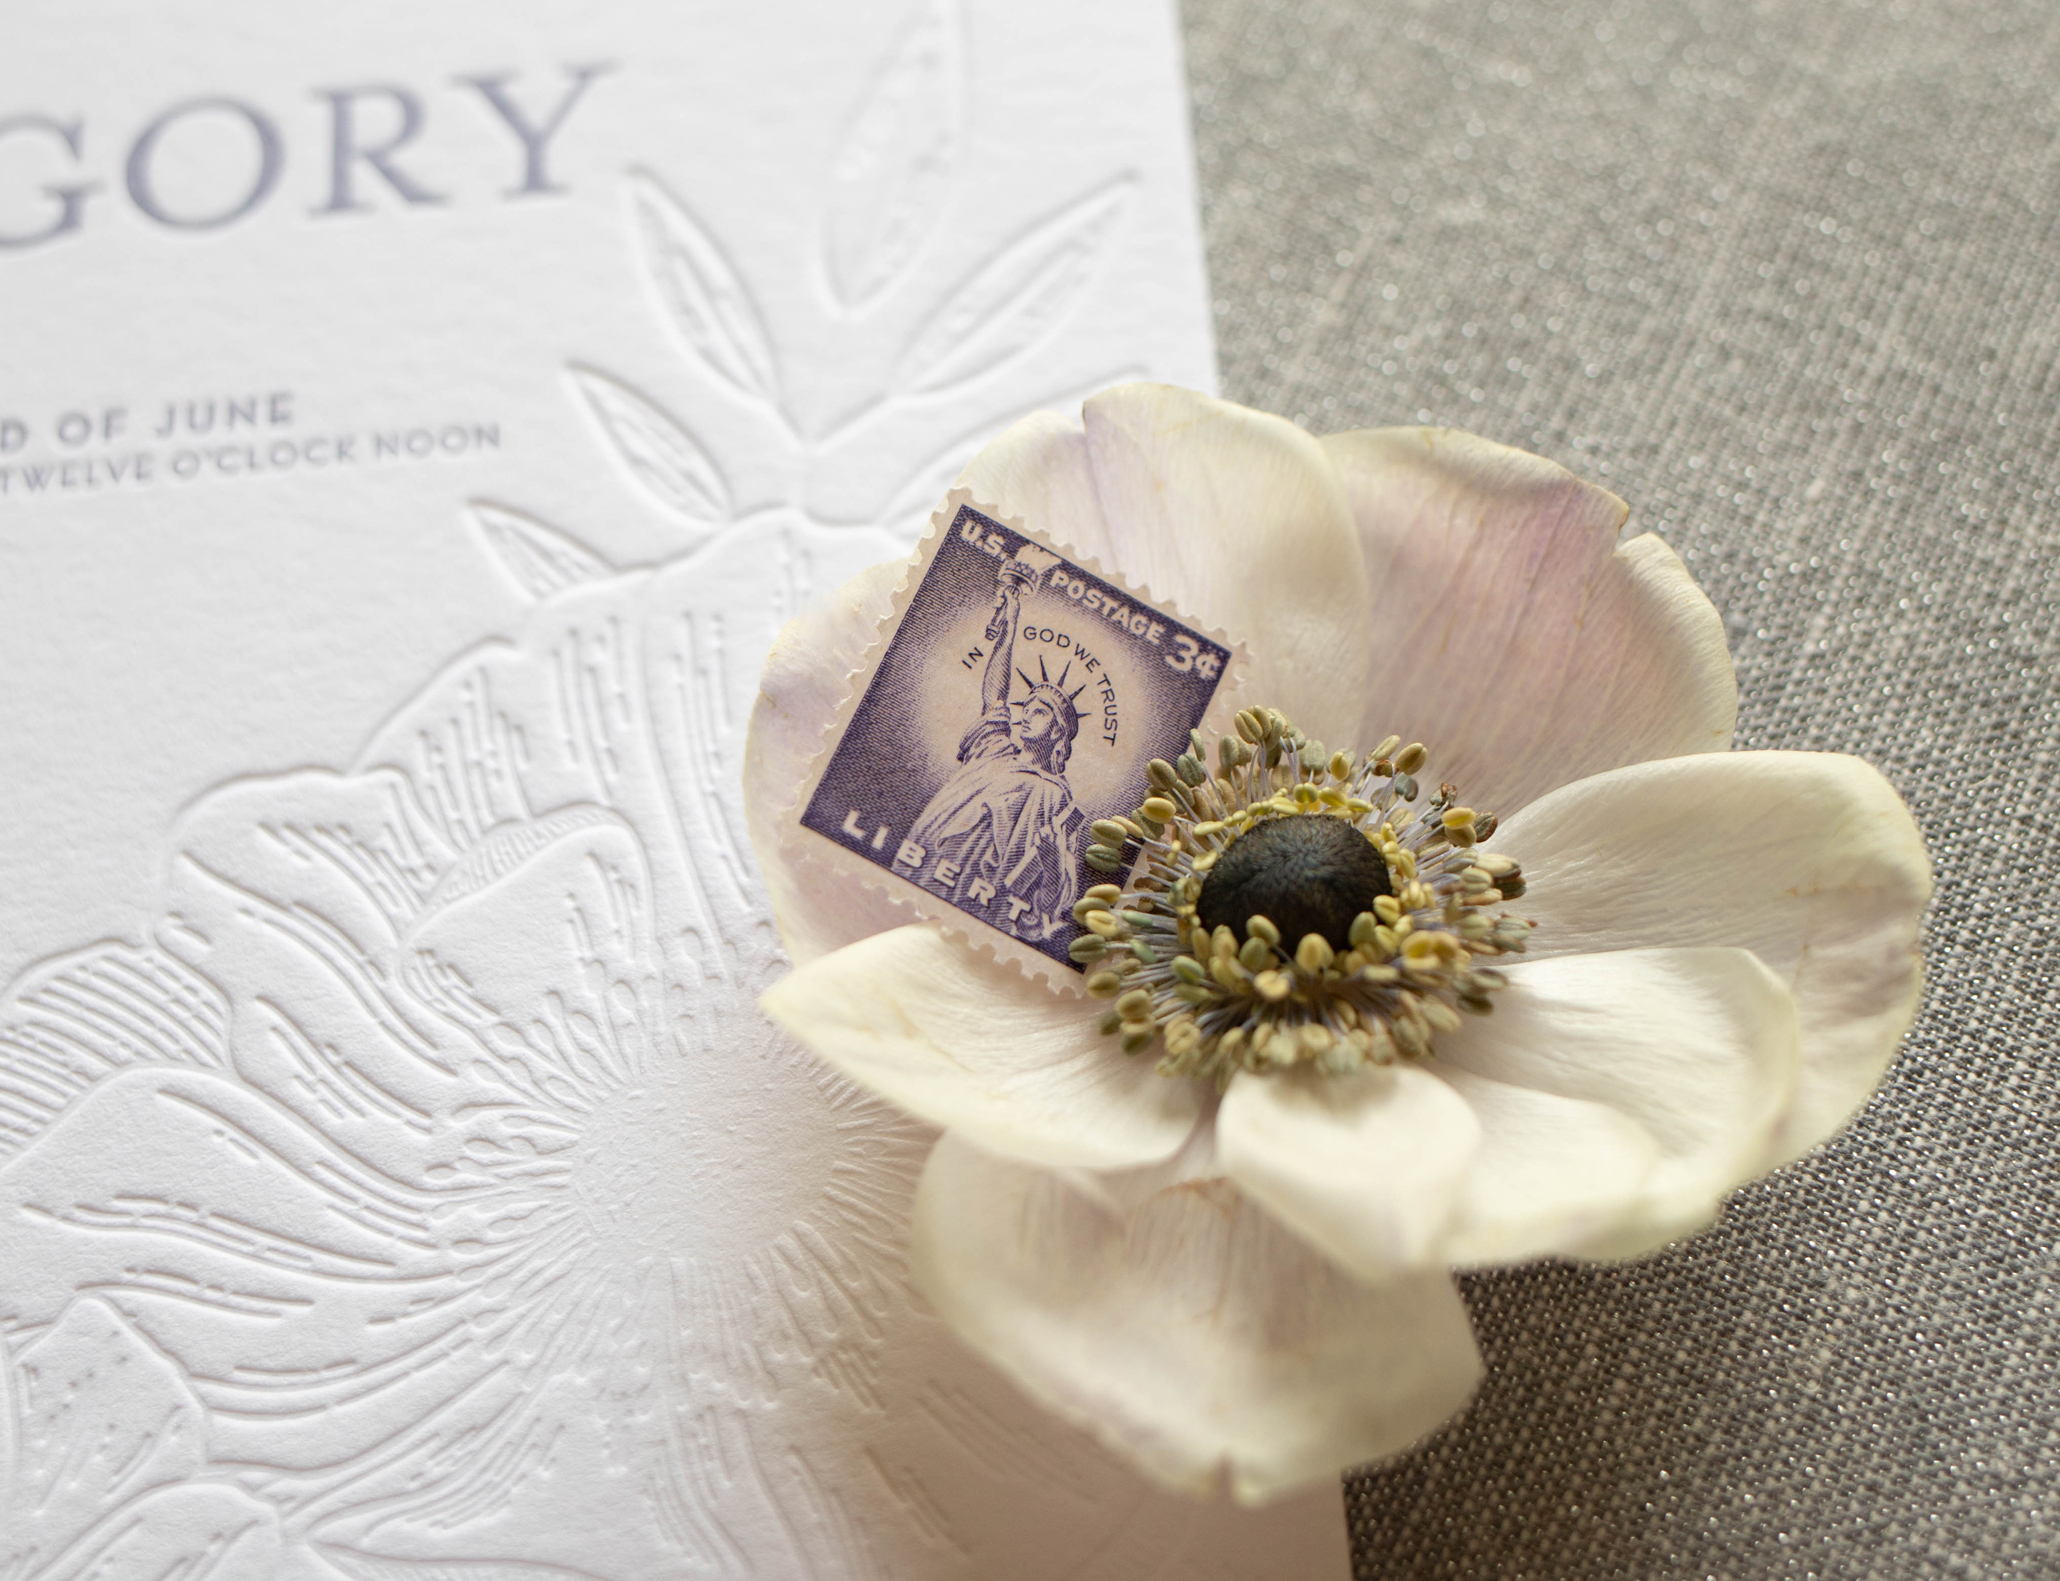 unique modern letterpress wedding invitation, floral illustration inspired by nature